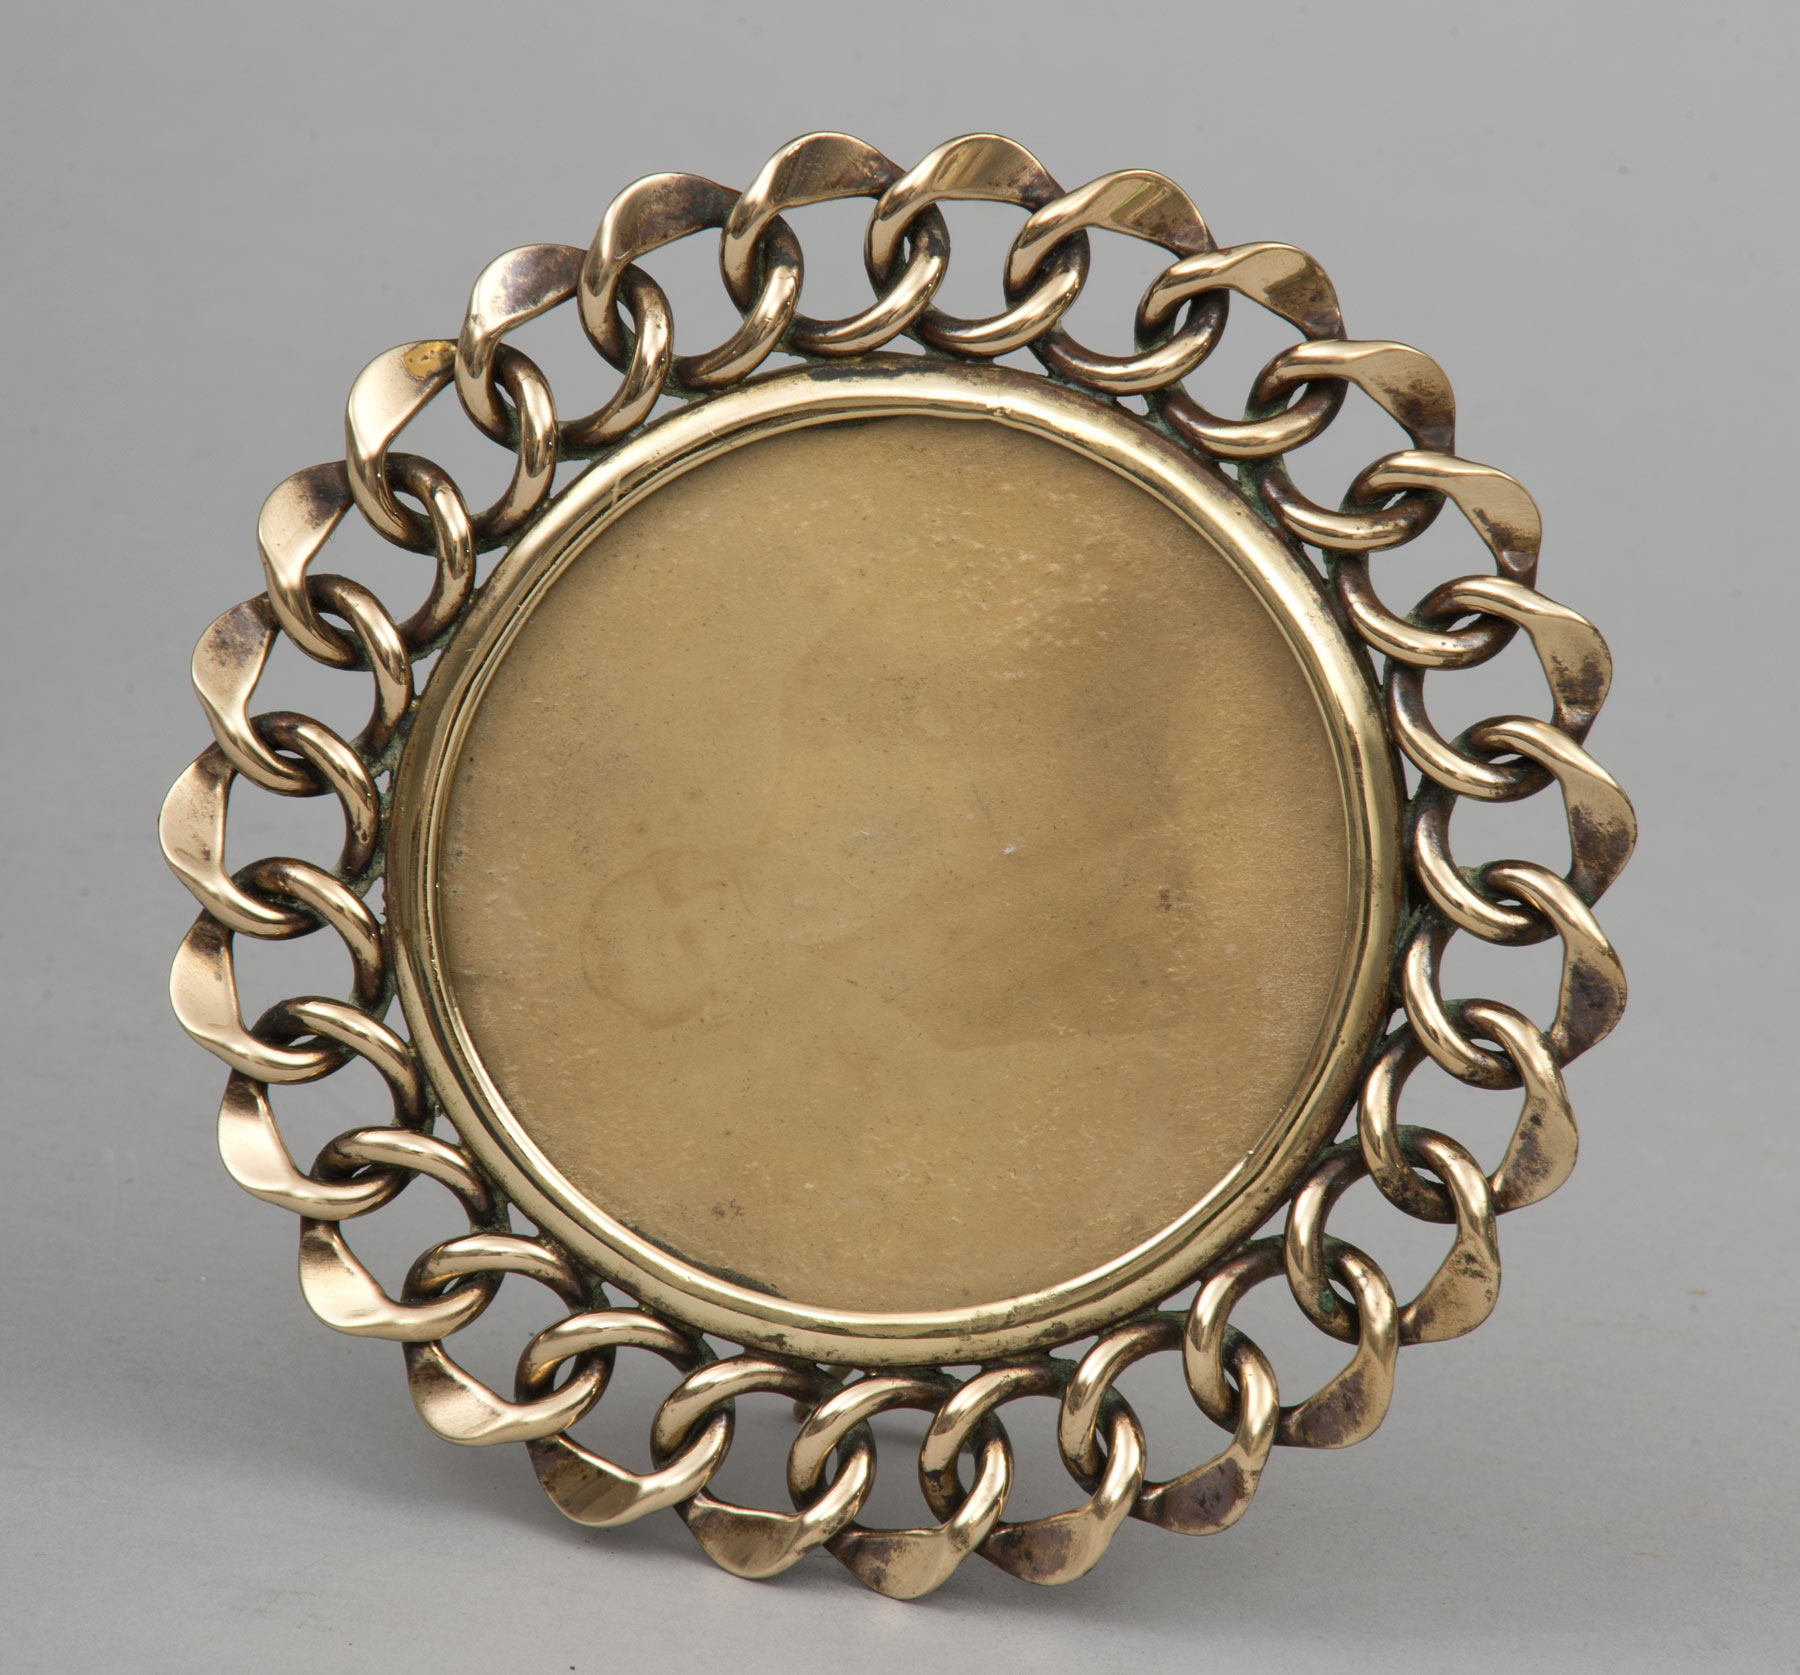 round brass ring frame circa 1880